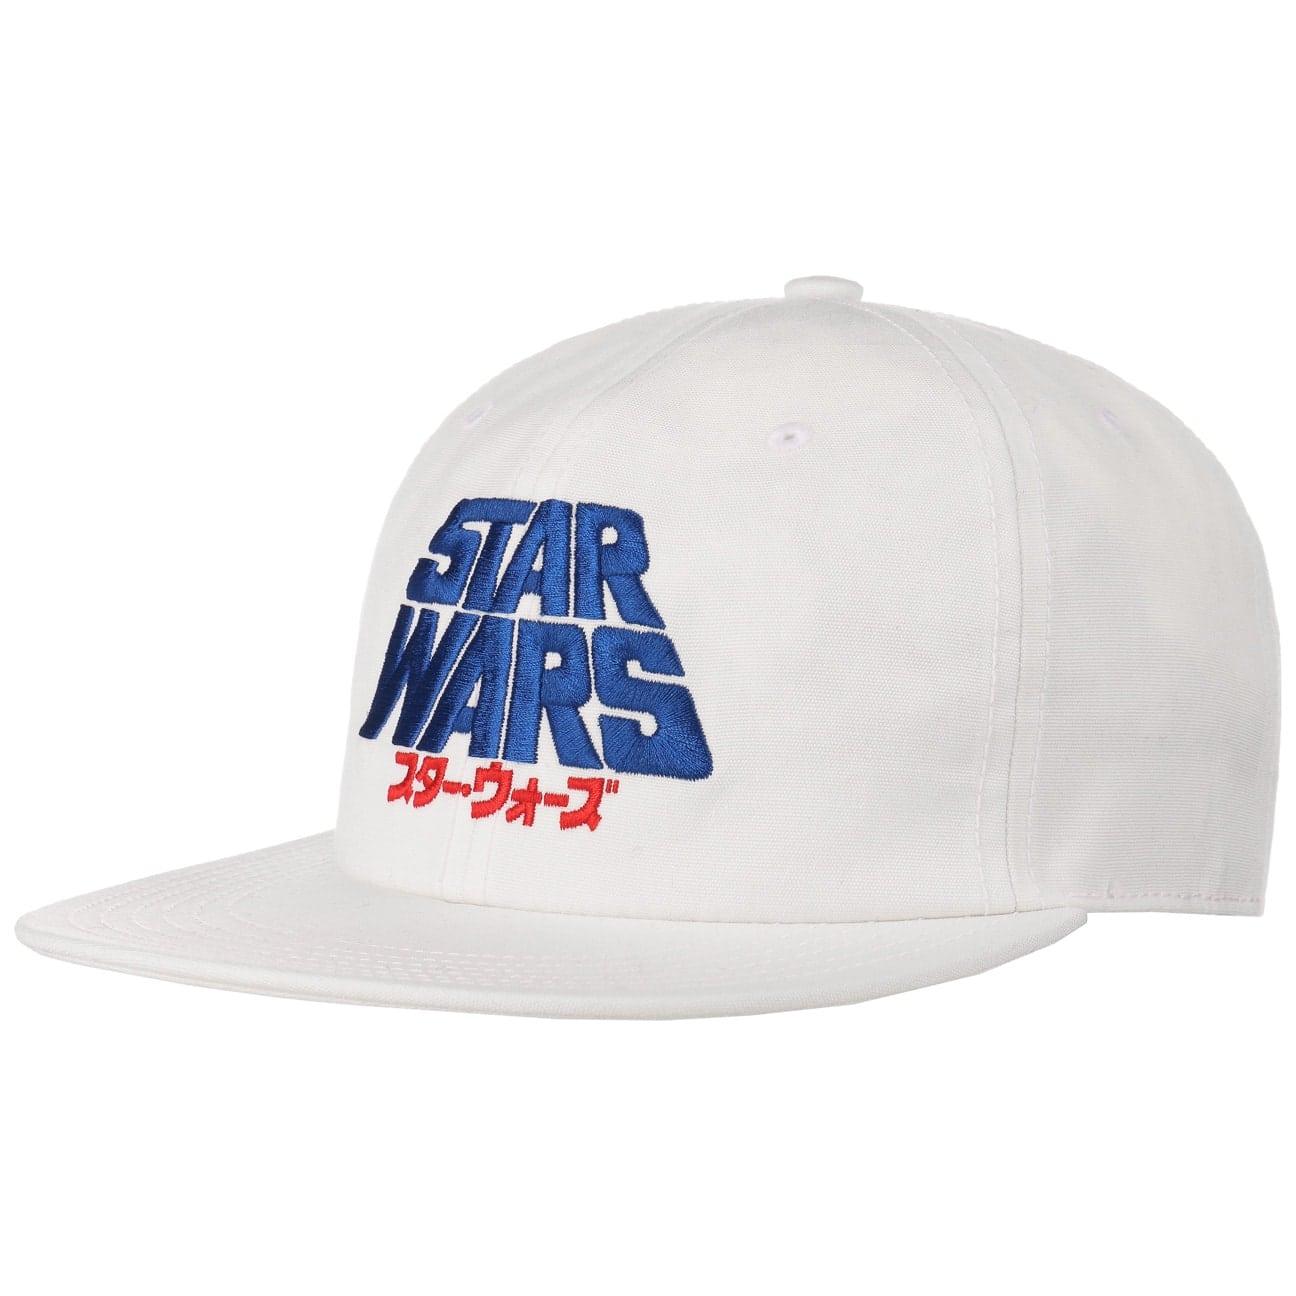 Gorra Star Wars Unstruct by dedicated